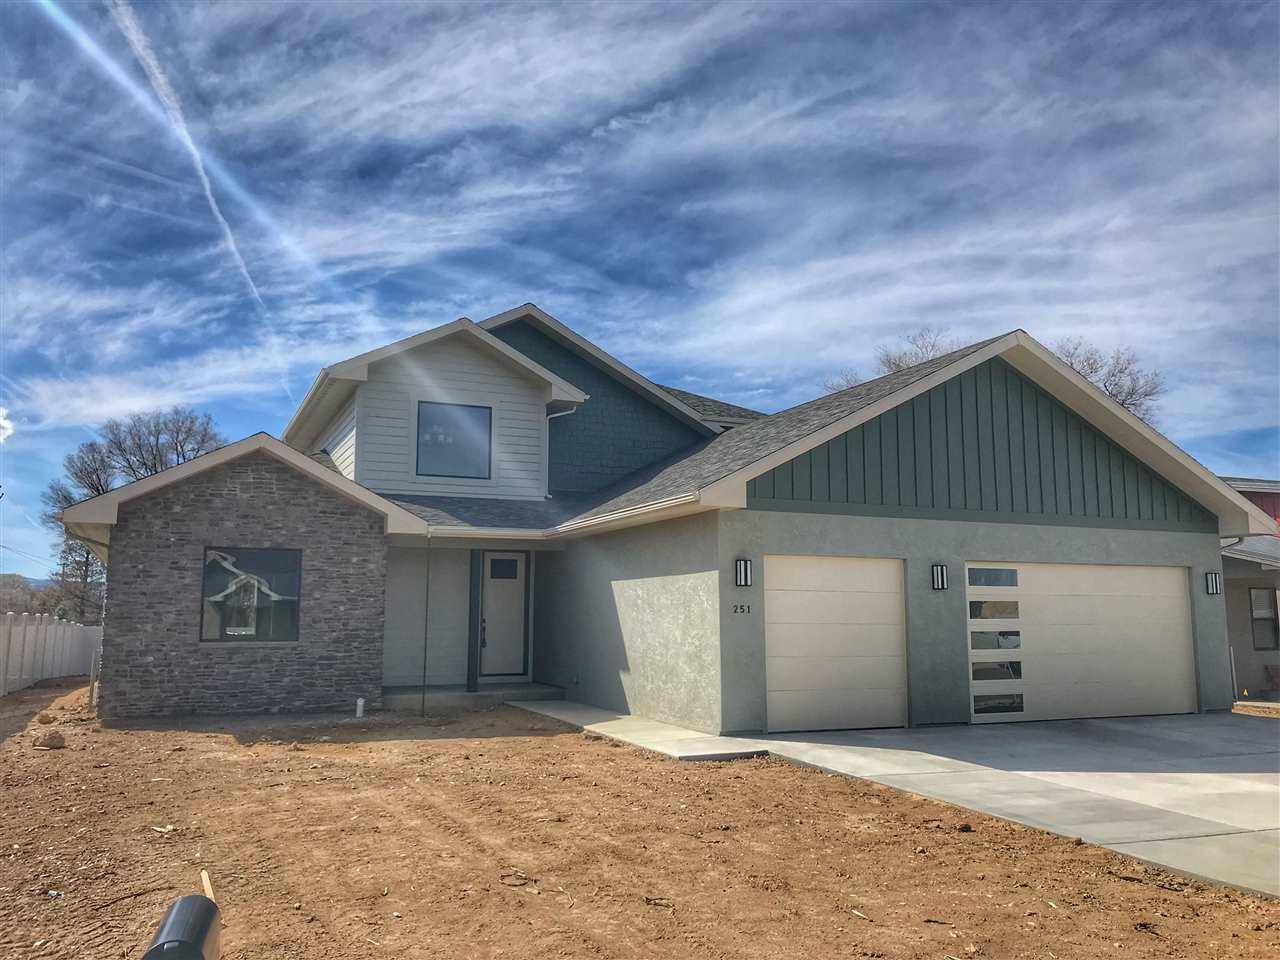 251 Durant Street, Grand Junction, CO 81503